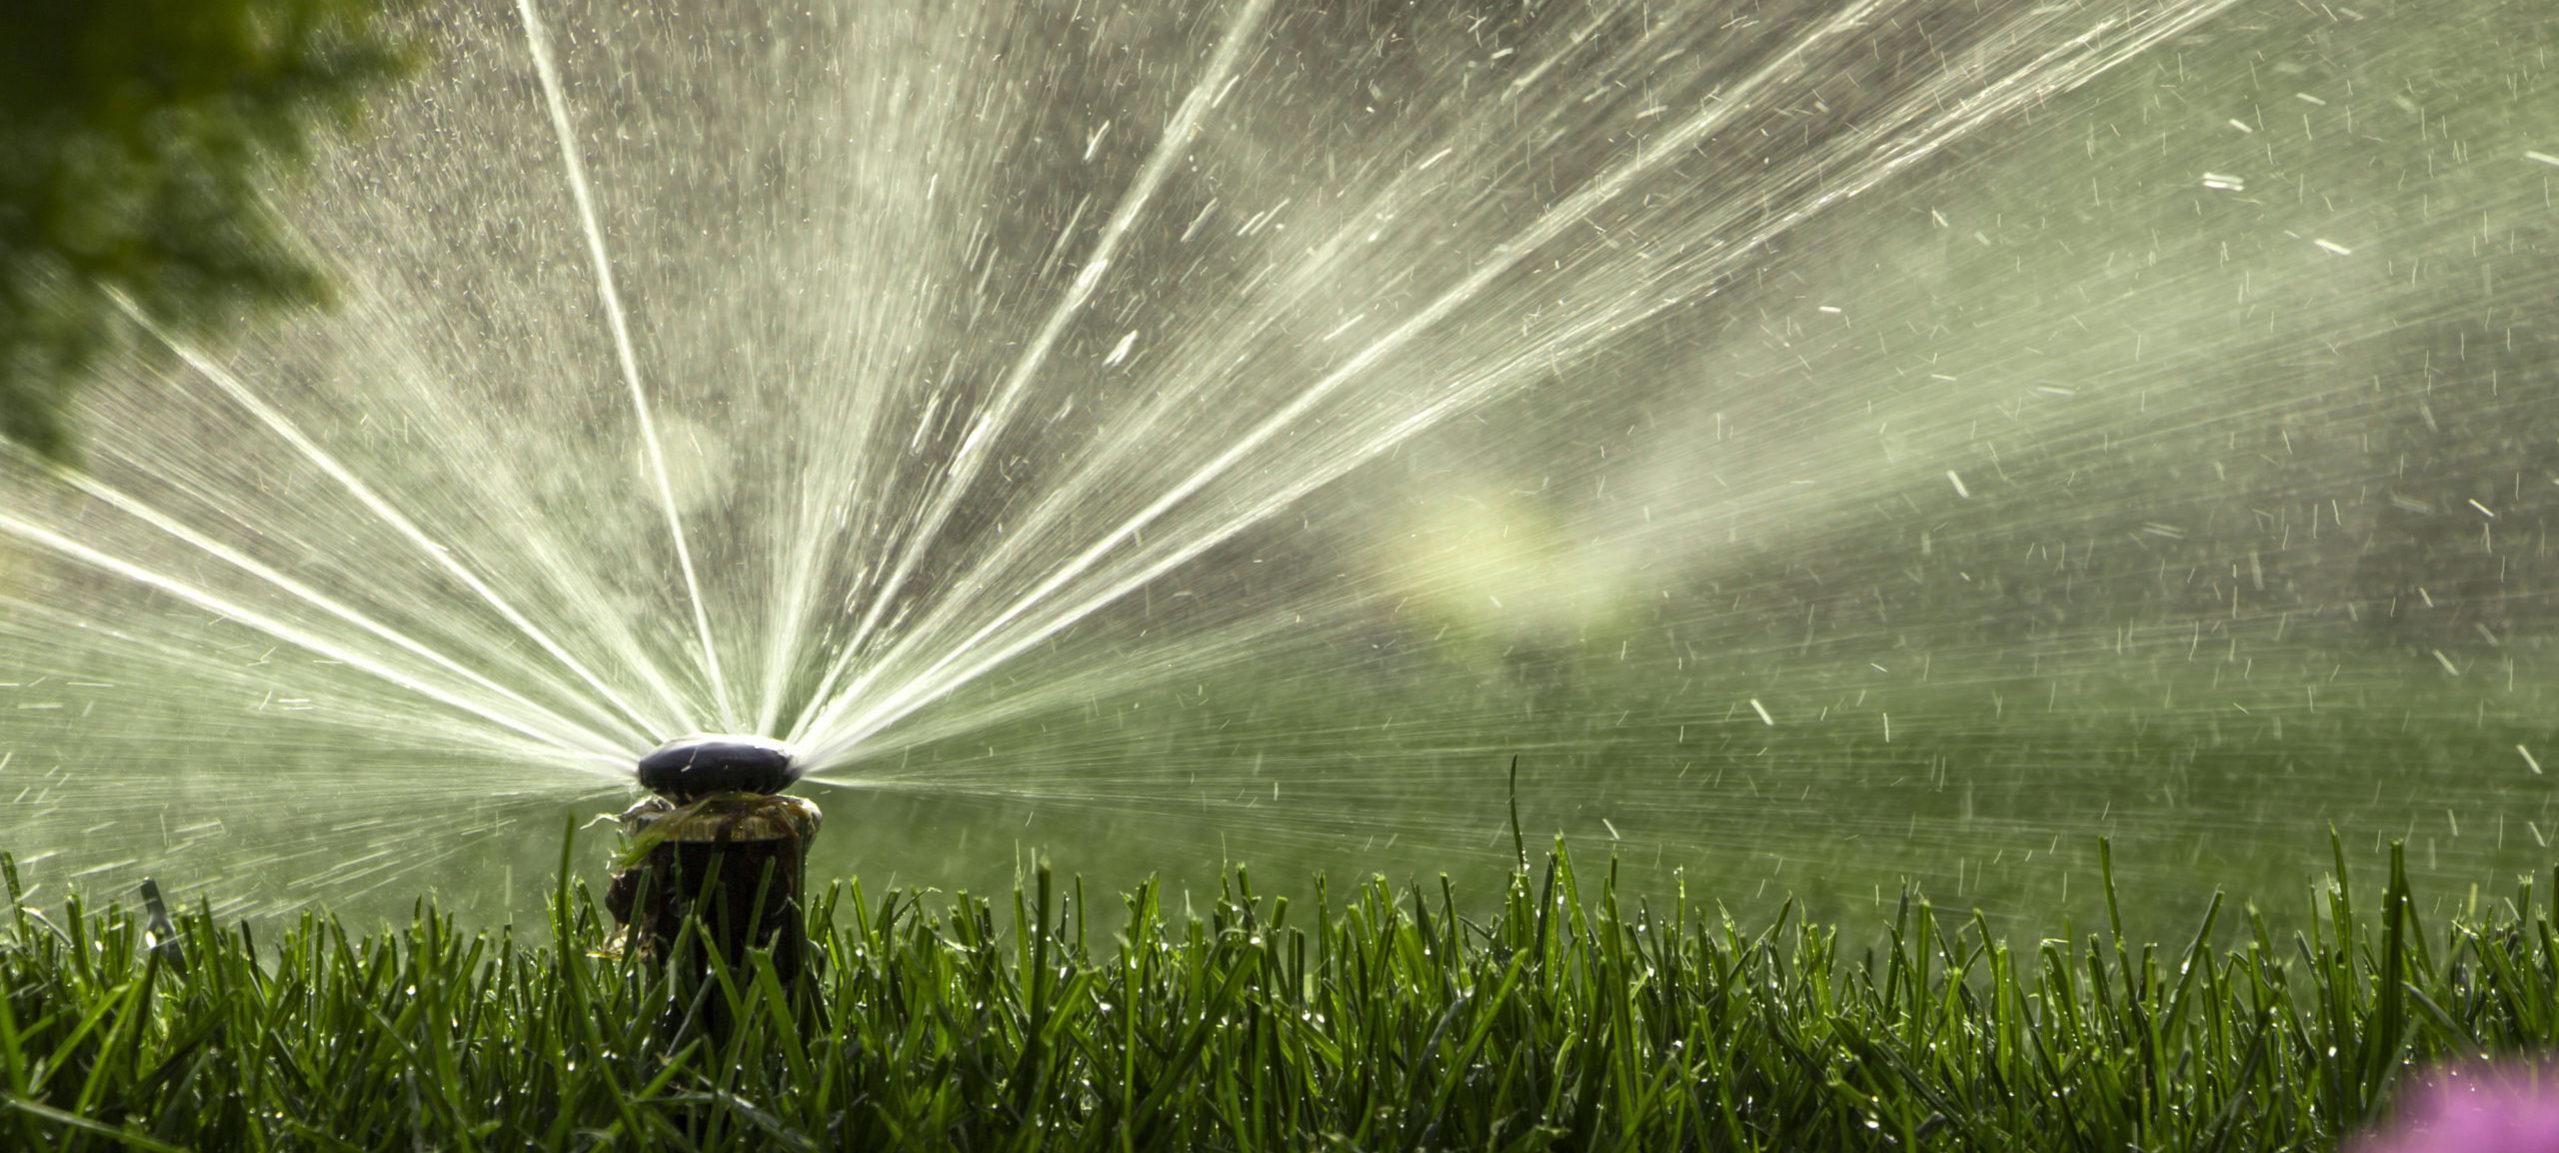 salt-lake-city-sprinkler-system